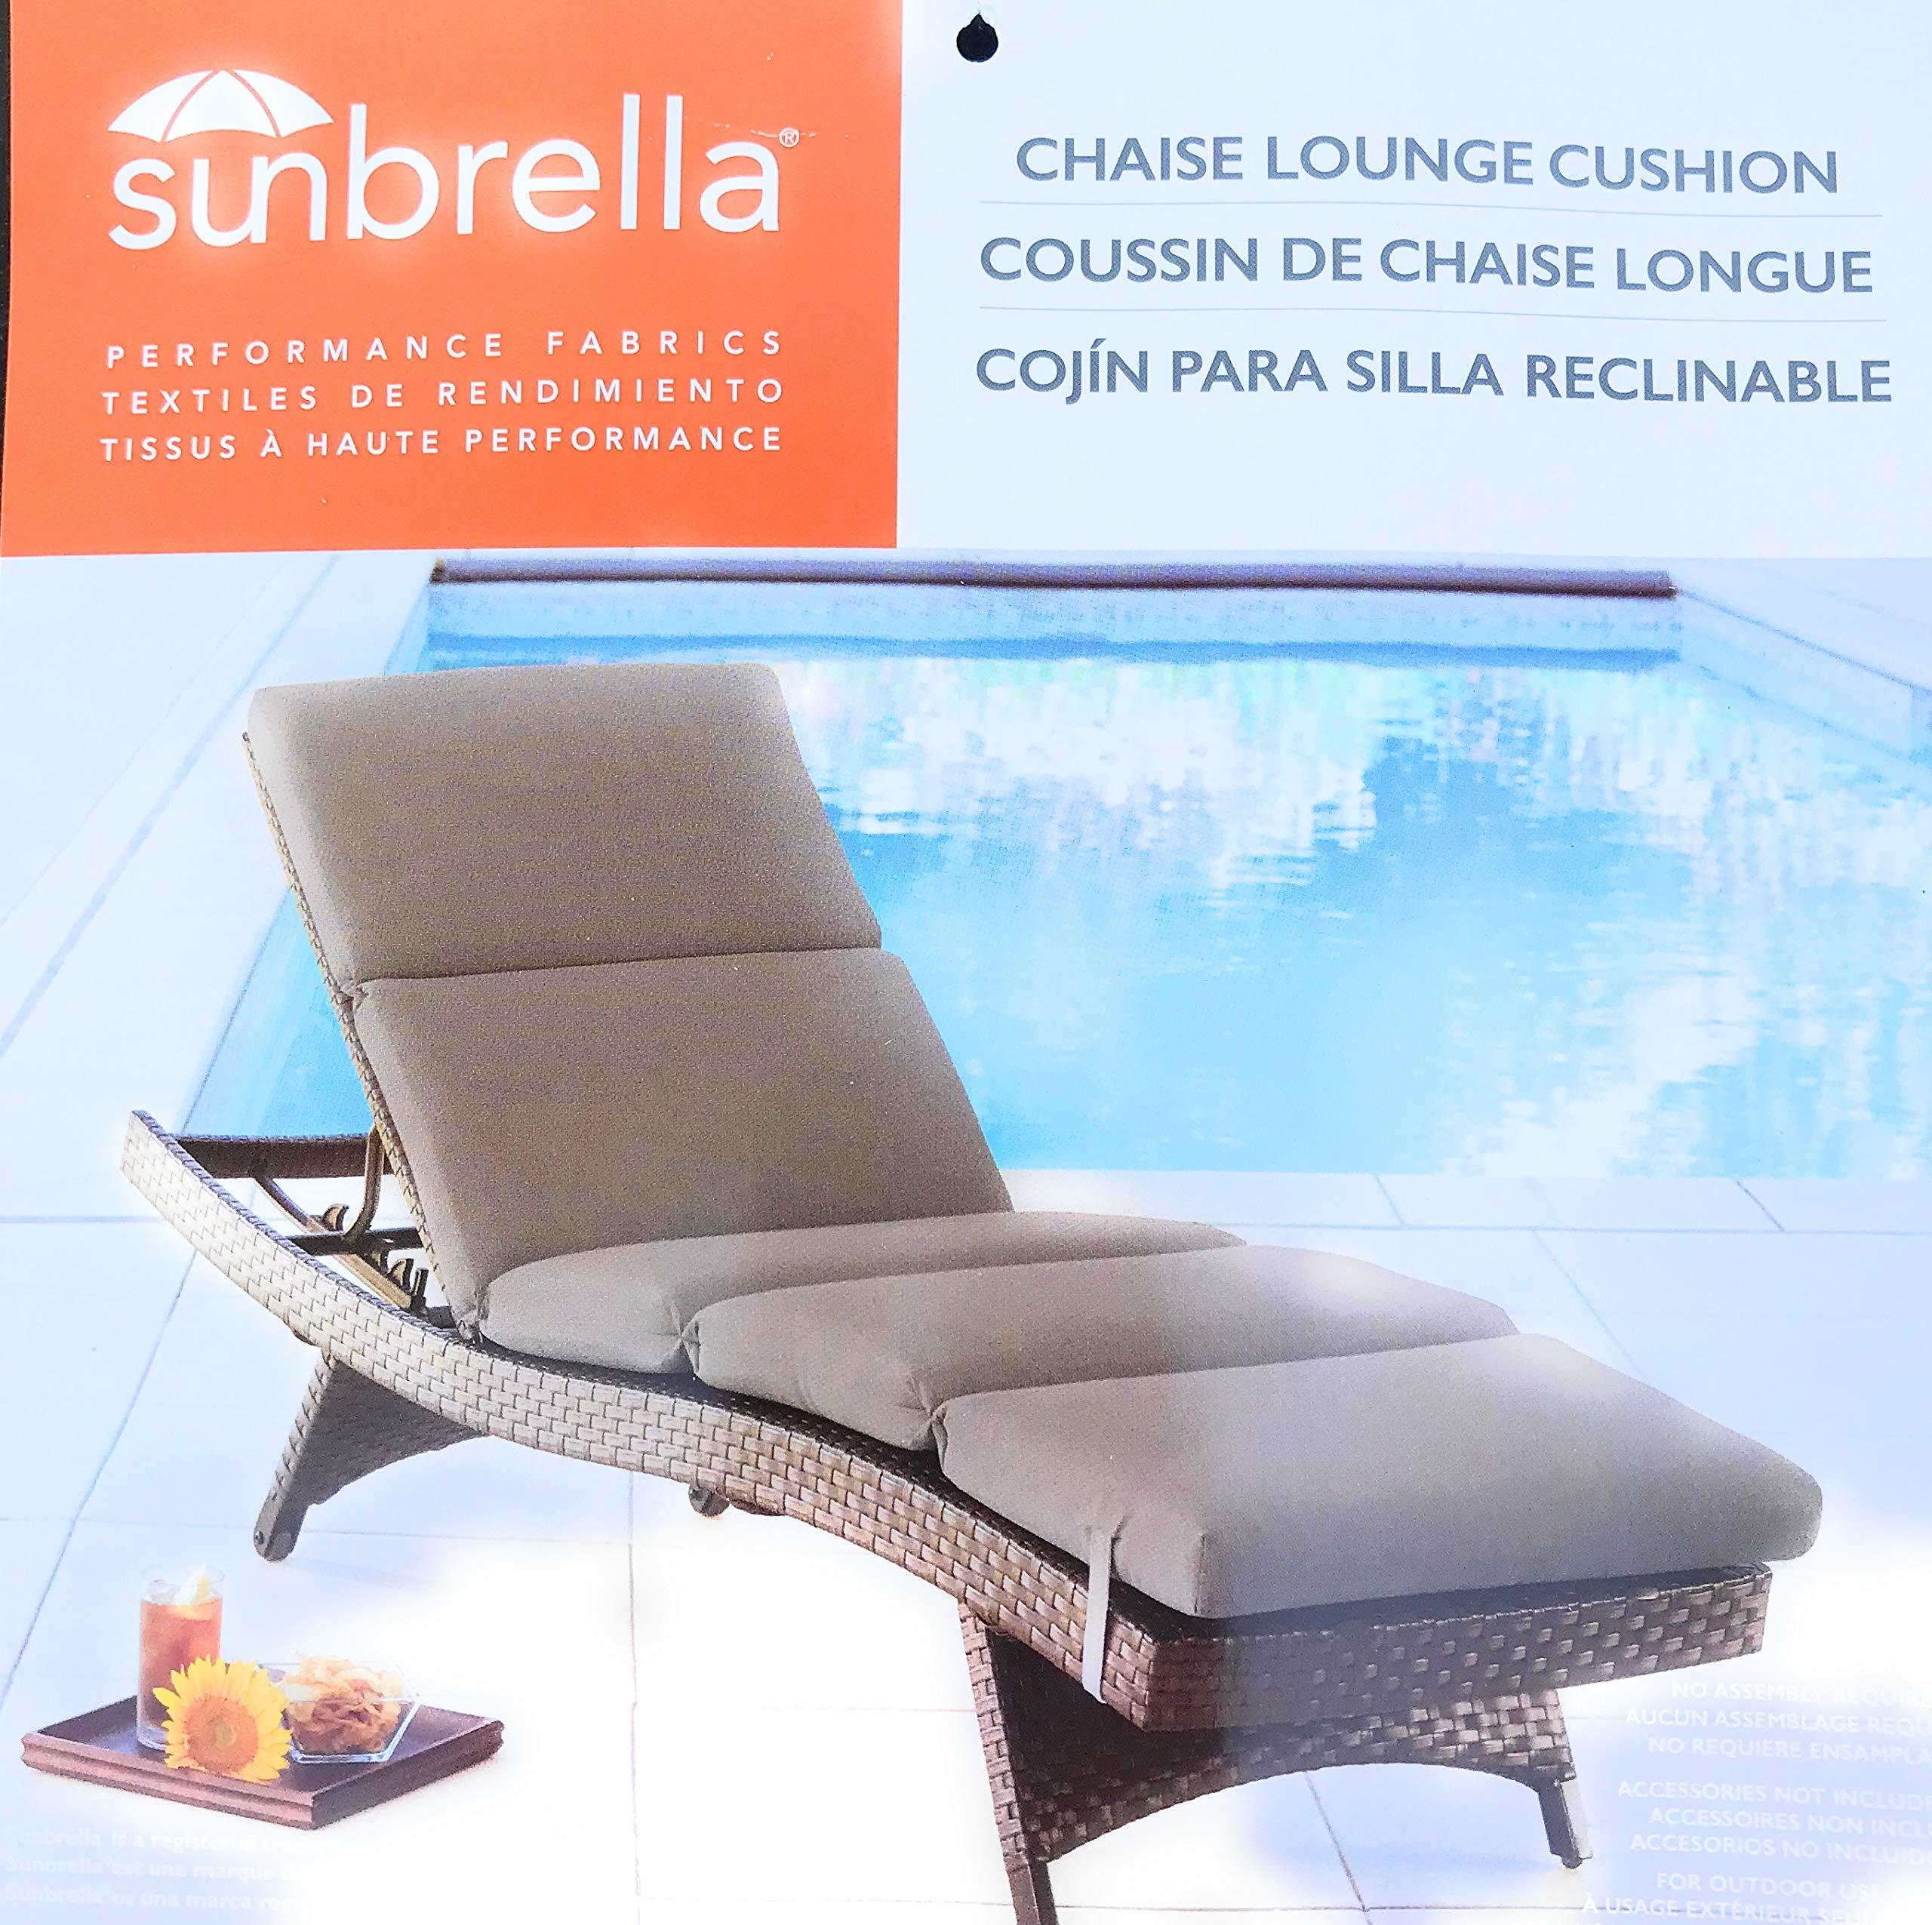 Sunbrella 75x25 Tan Chaise Lounge Cushion Chair Pad Replacement New